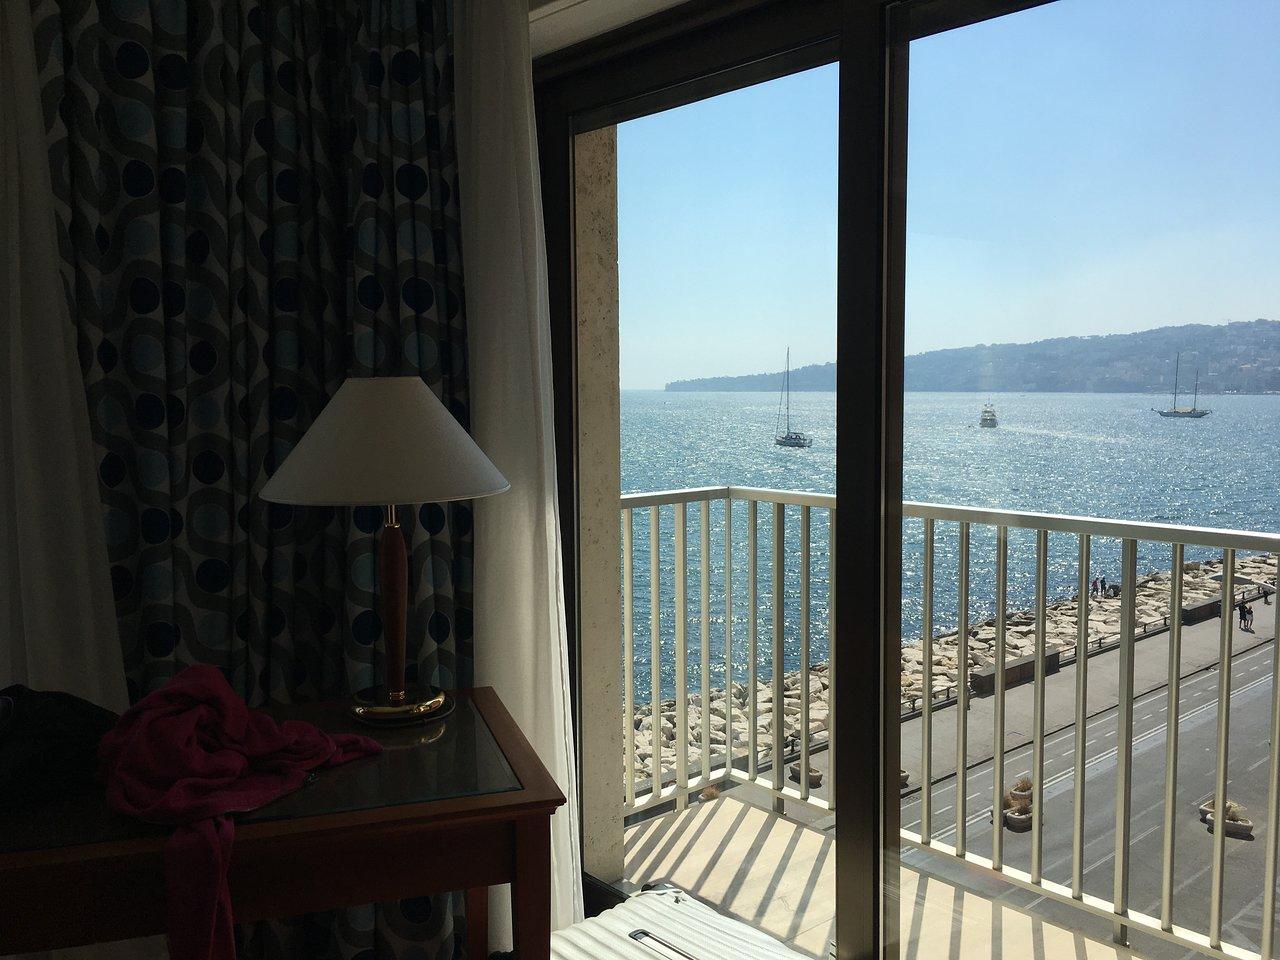 Hotel Royal Continental 175 3 0 6 Prices Reviews Naples Italy Tripadvisor